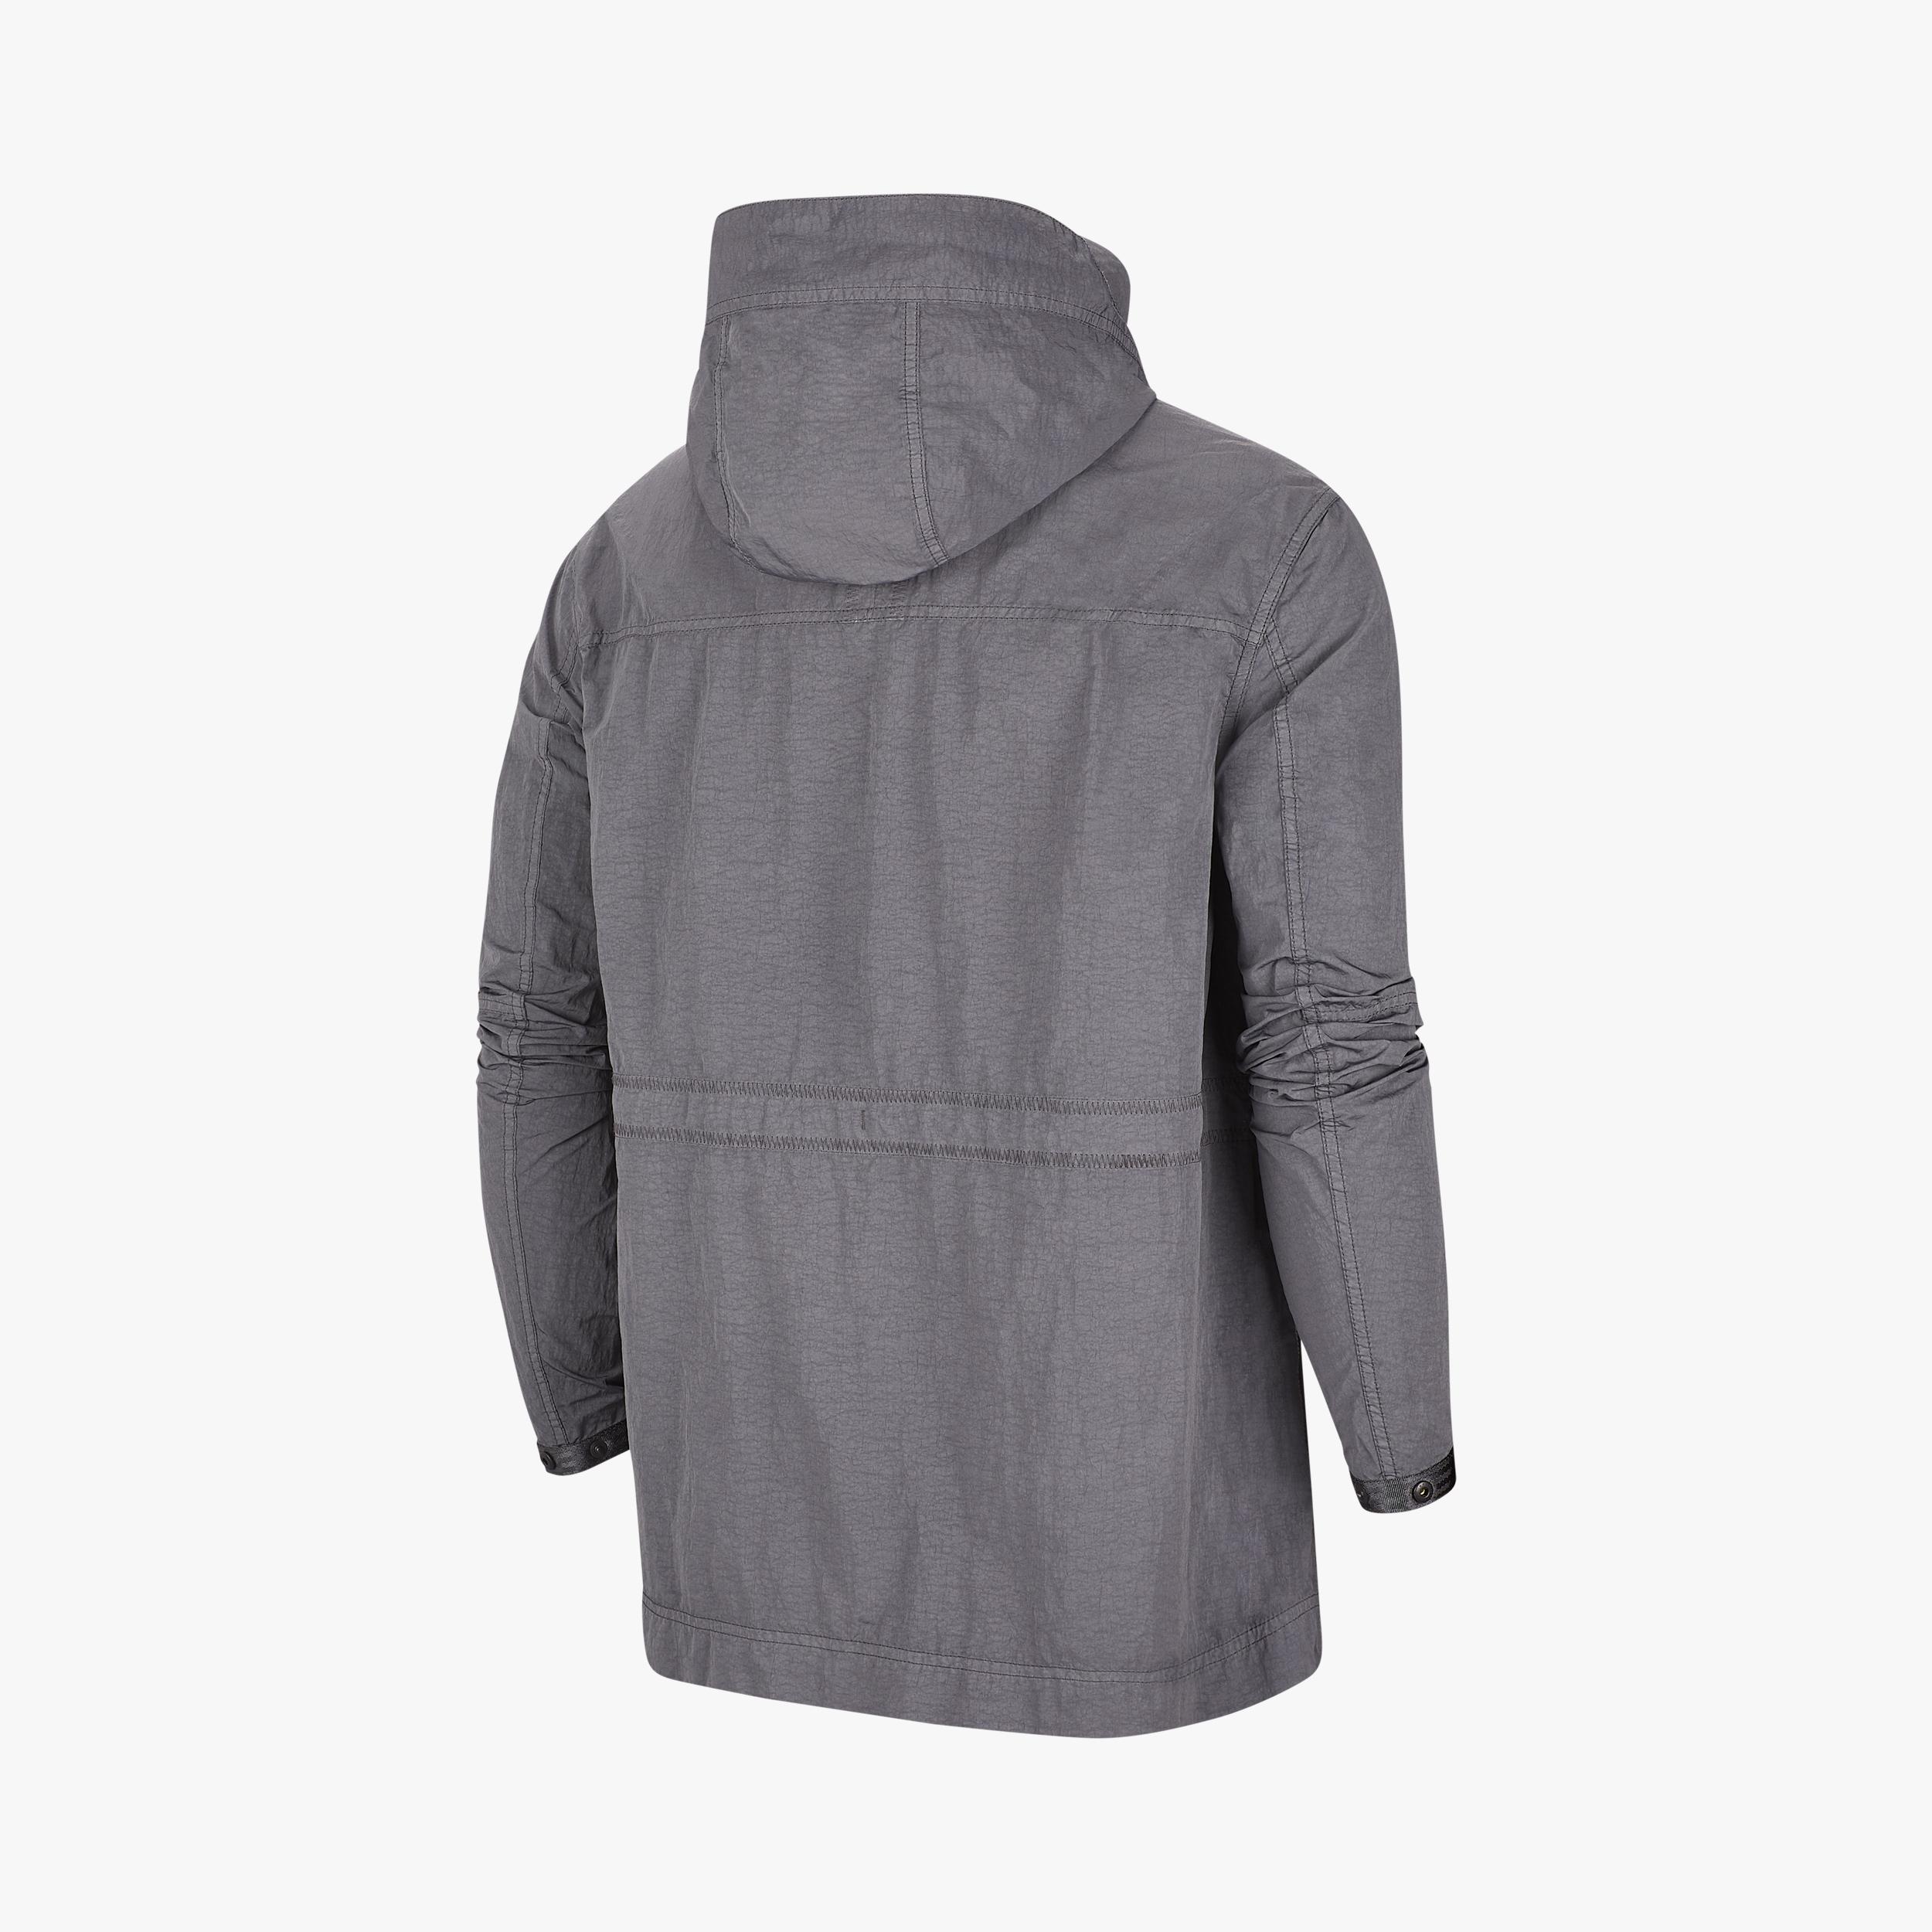 Nike Tech Pack Jacket Bv4430 021 Sneakersnstuff Sneakers Streetwear Online Since 1999